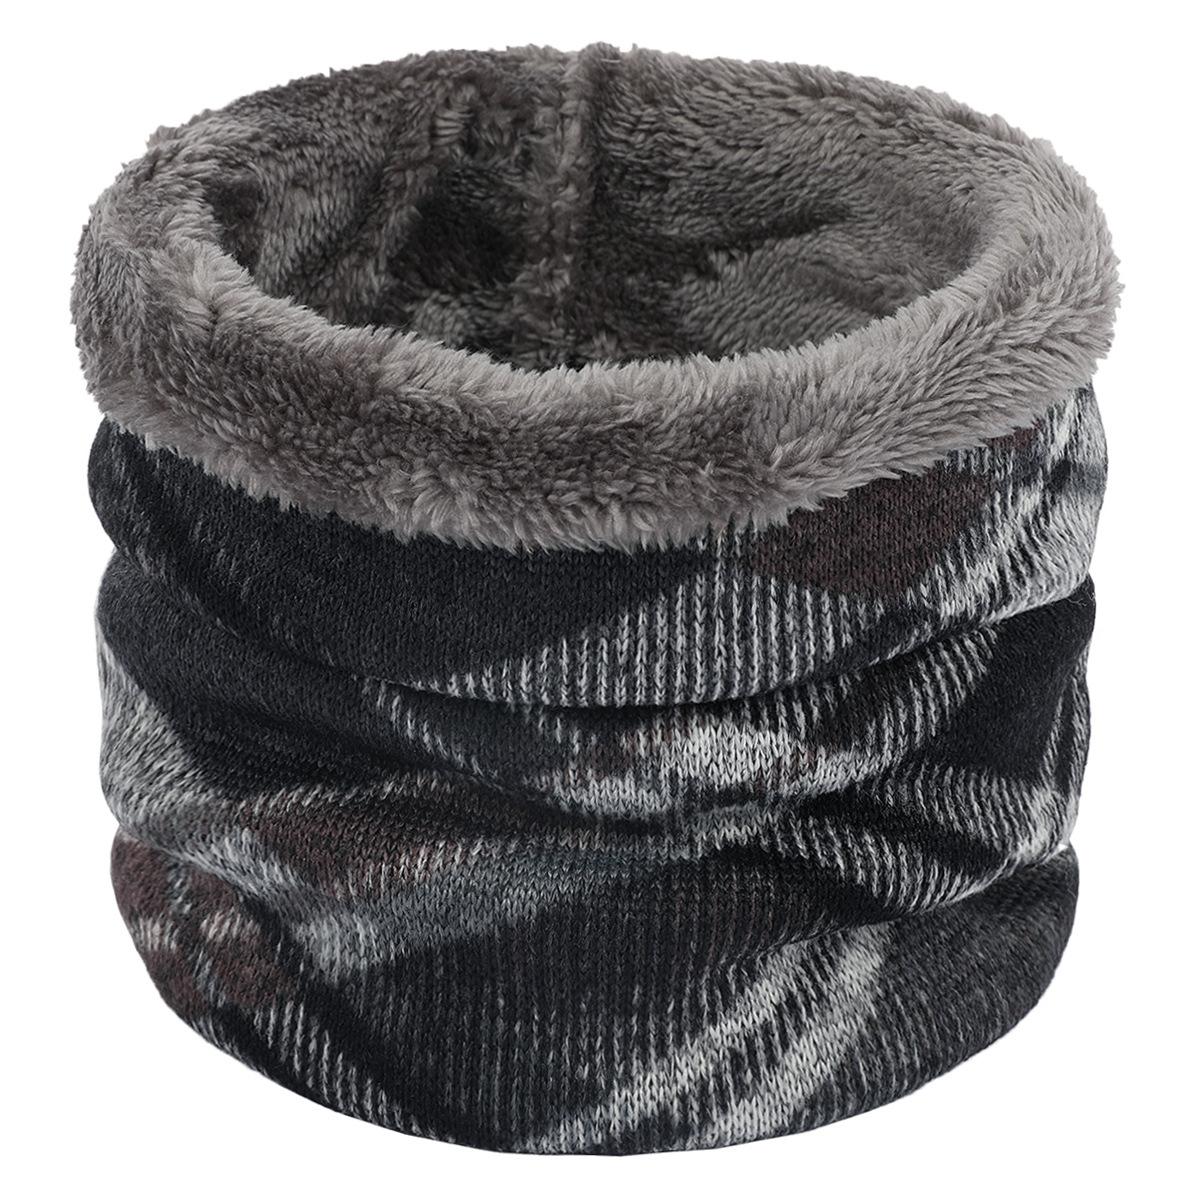 Мужские теплые шарфы Артикул 606992896574